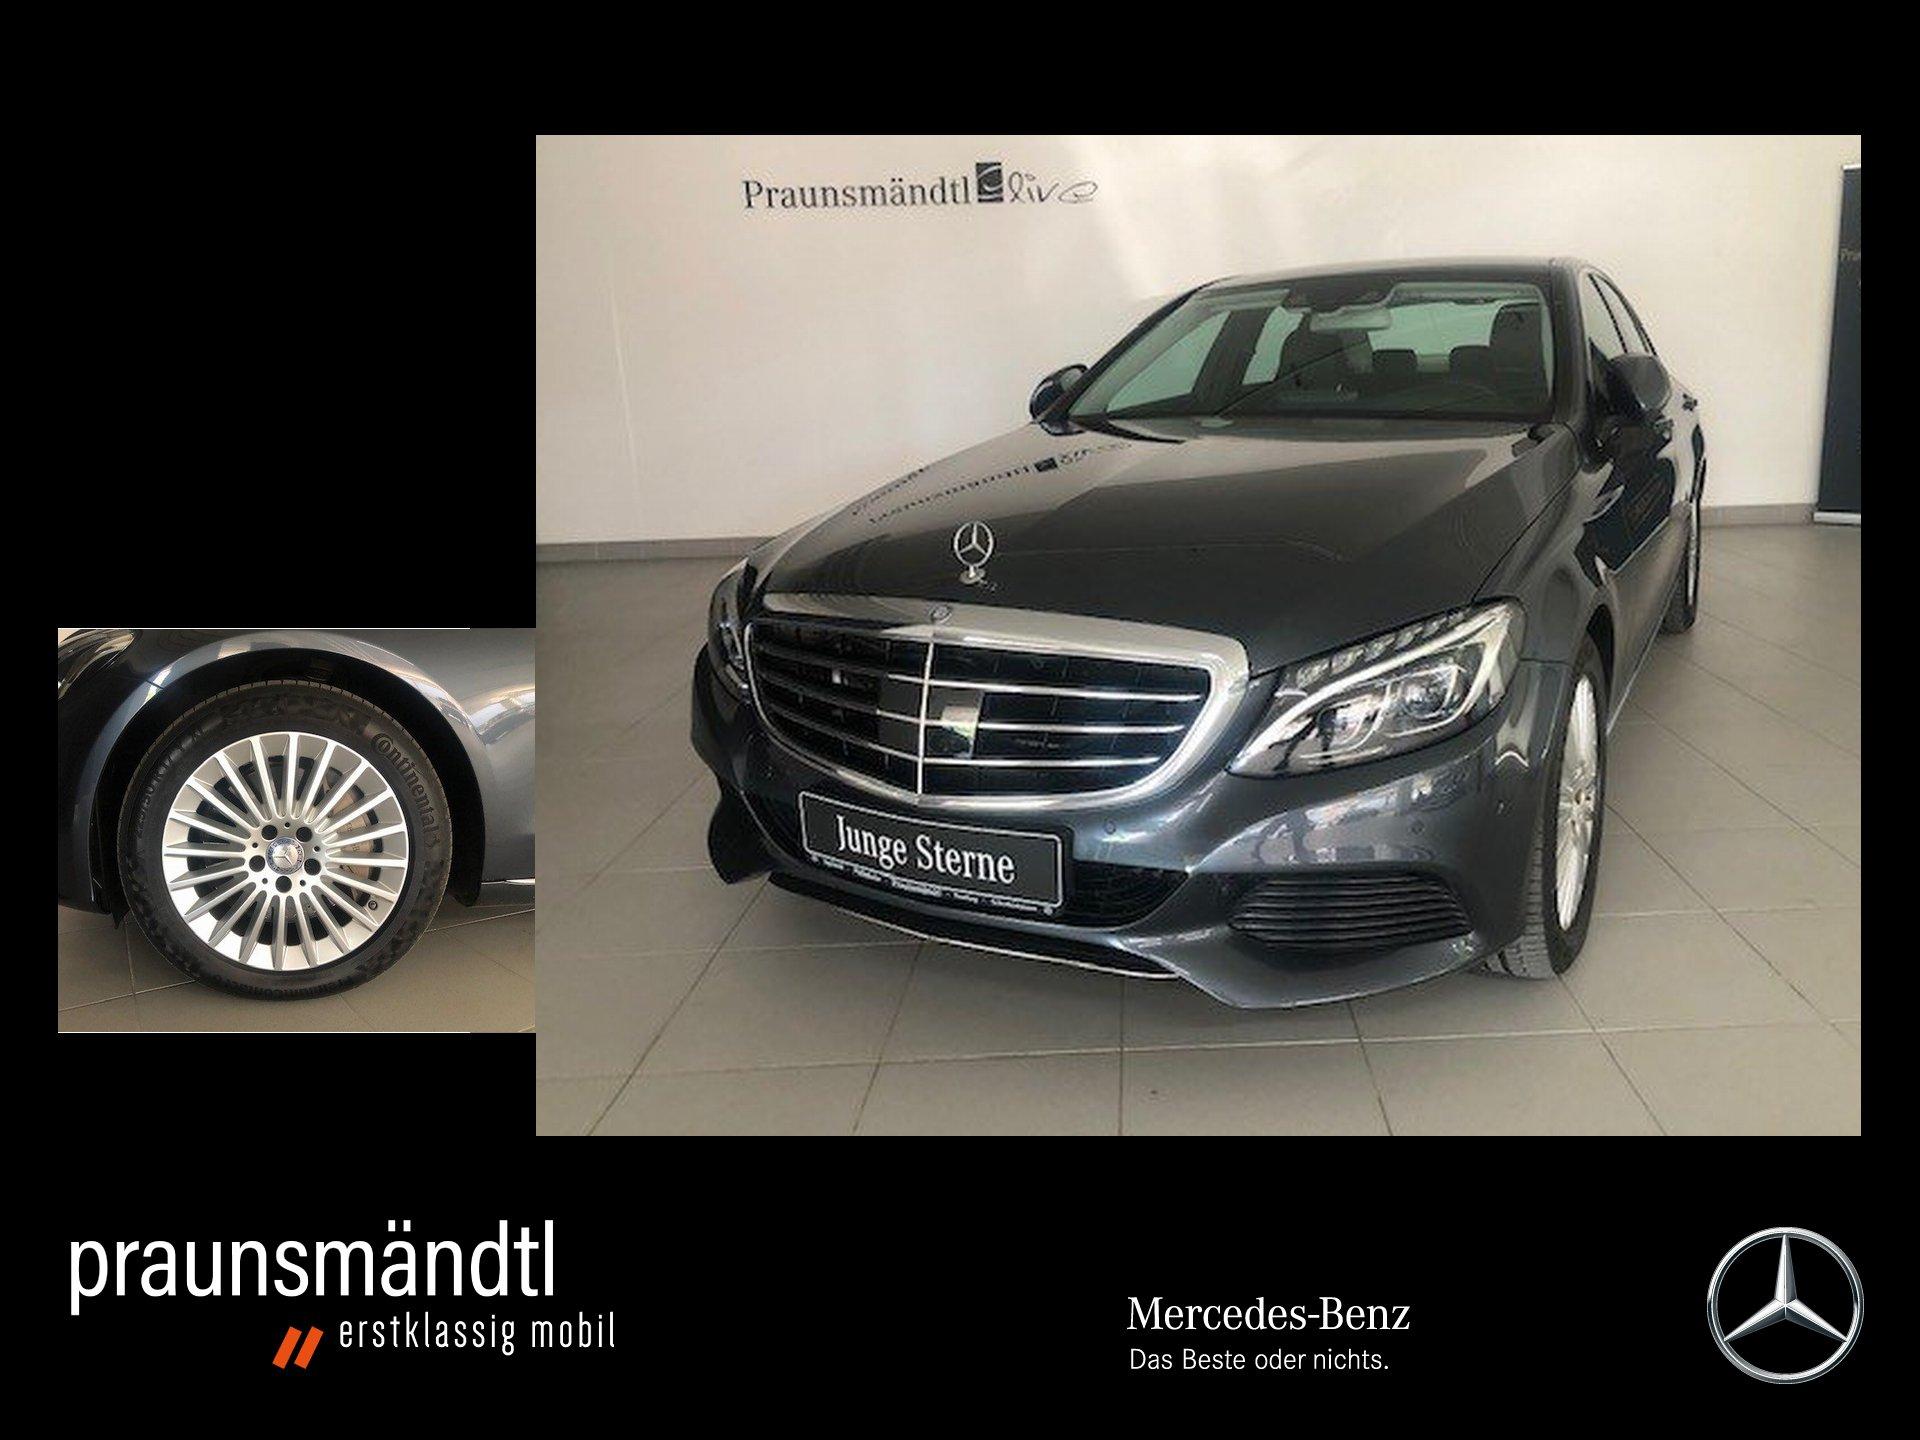 Mercedes-Benz C 400 4M Exclusive LED/Pano/Com/AIR/Distr+/Kamer, Jahr 2015, Benzin